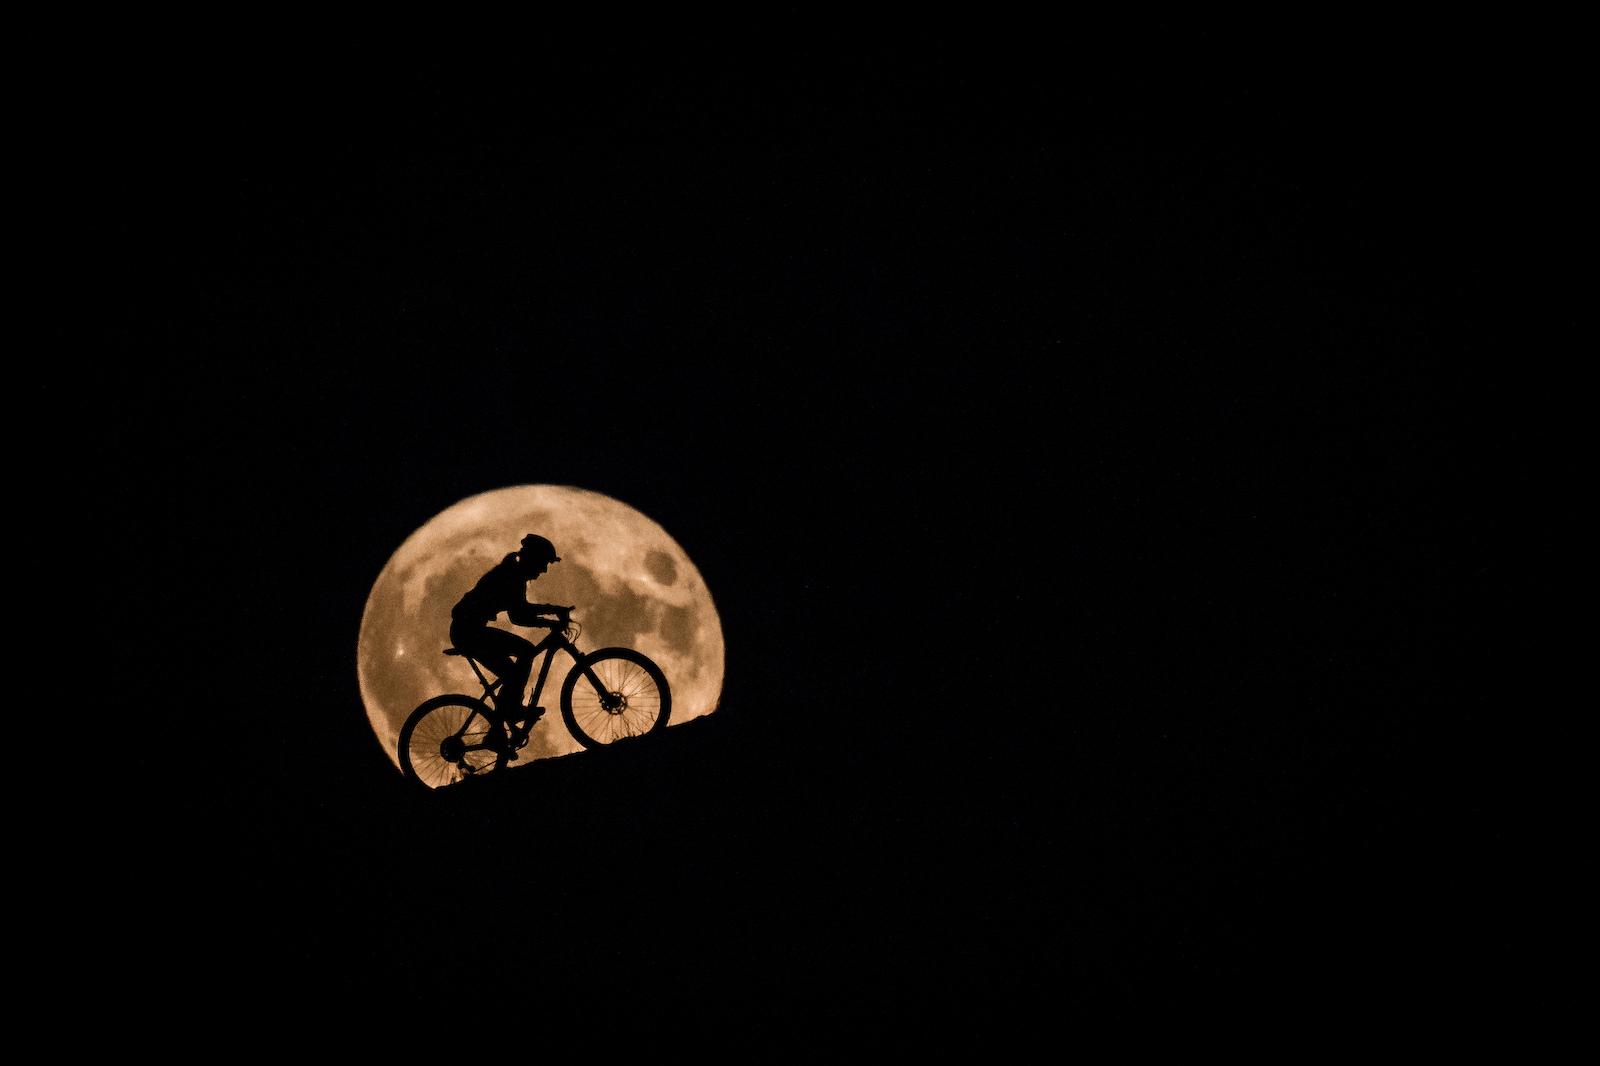 Karla Stepanova climbing a hill in the super moon light.